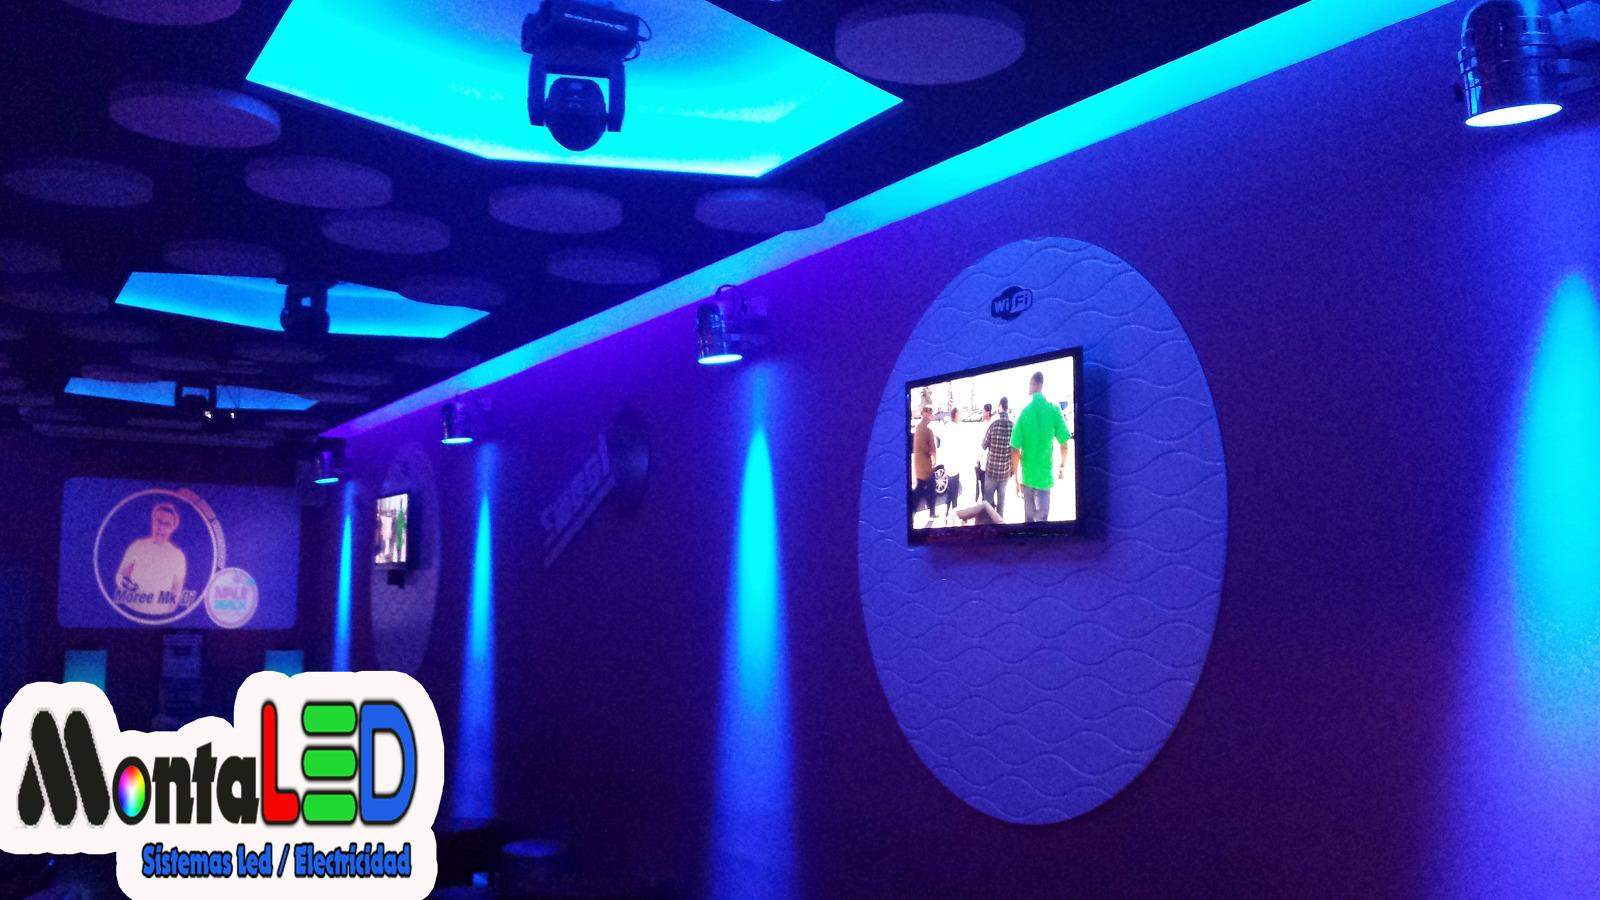 Foto instalaci n led bar de copas de montaled 439425 - Iluminacion de bares ...